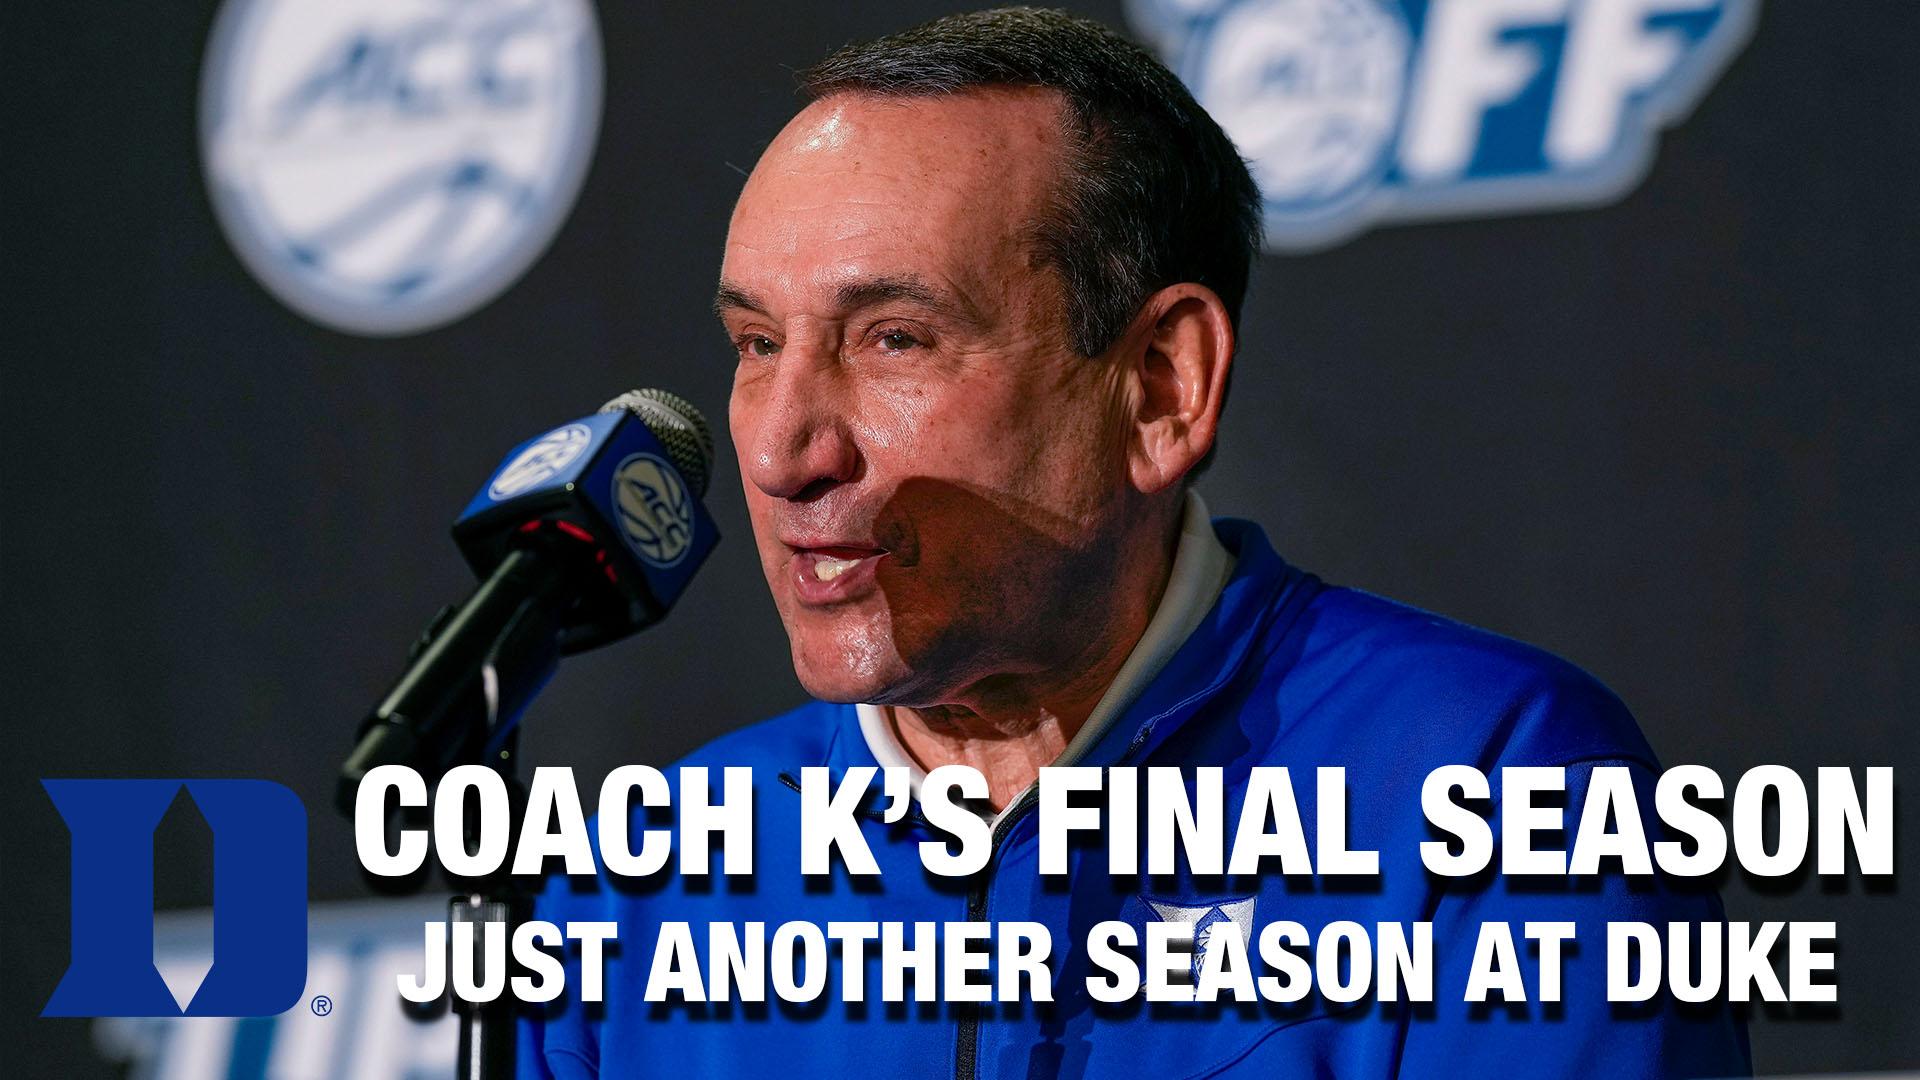 Coach K's Final Season Is Just Another Season At Duke